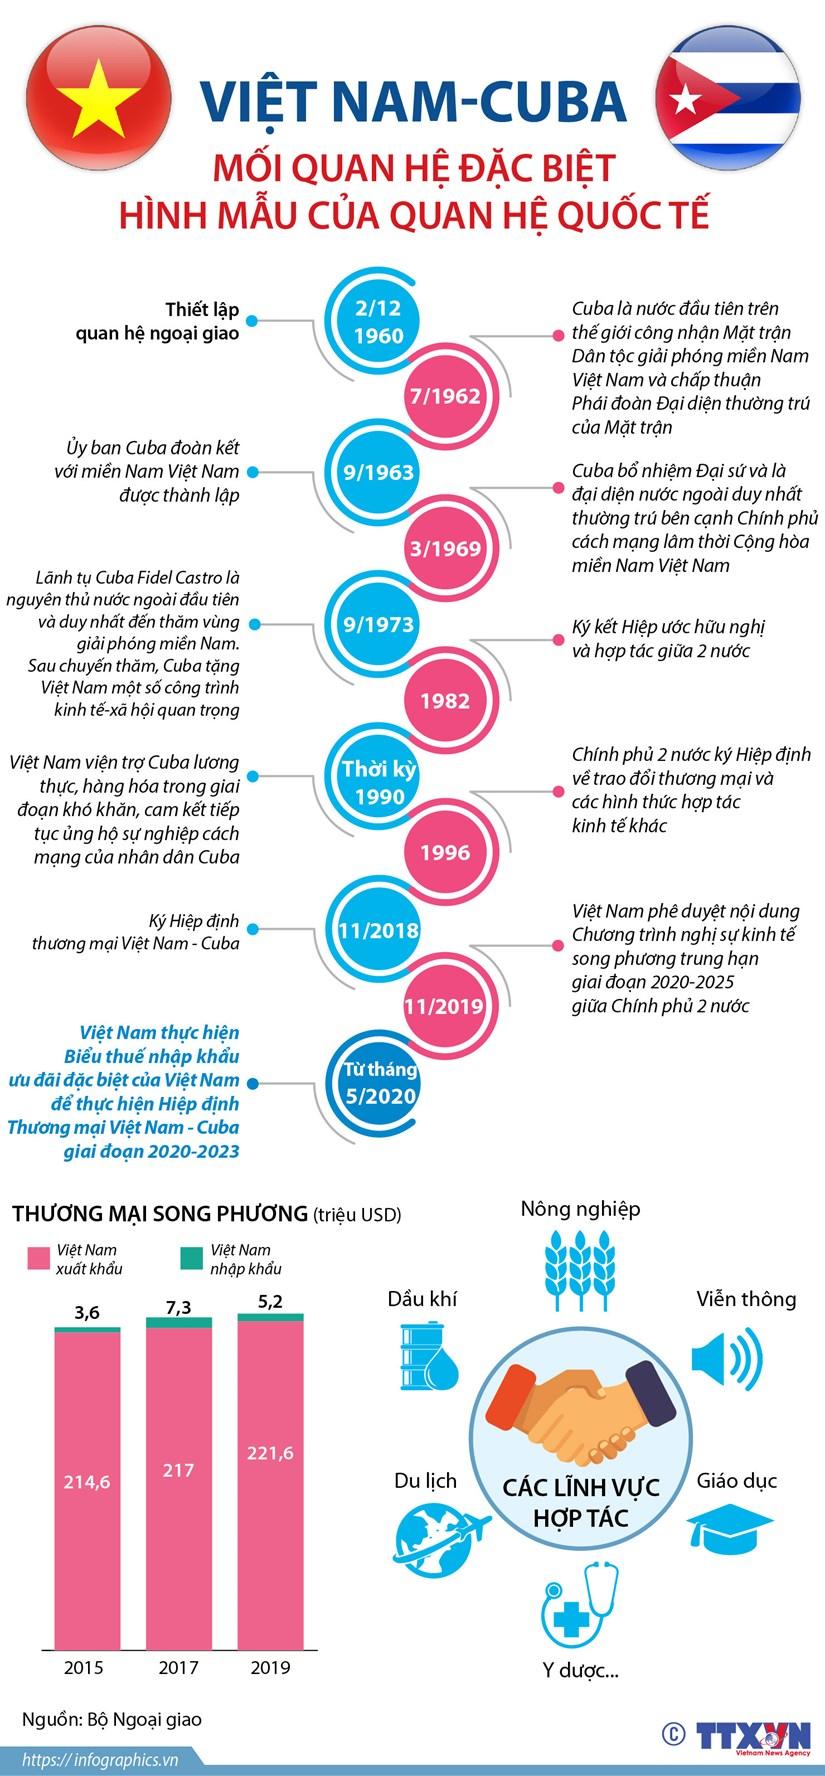 [Infographics] Viet Nam-Cuba: Hinh mau cua quan he quoc te hinh anh 1